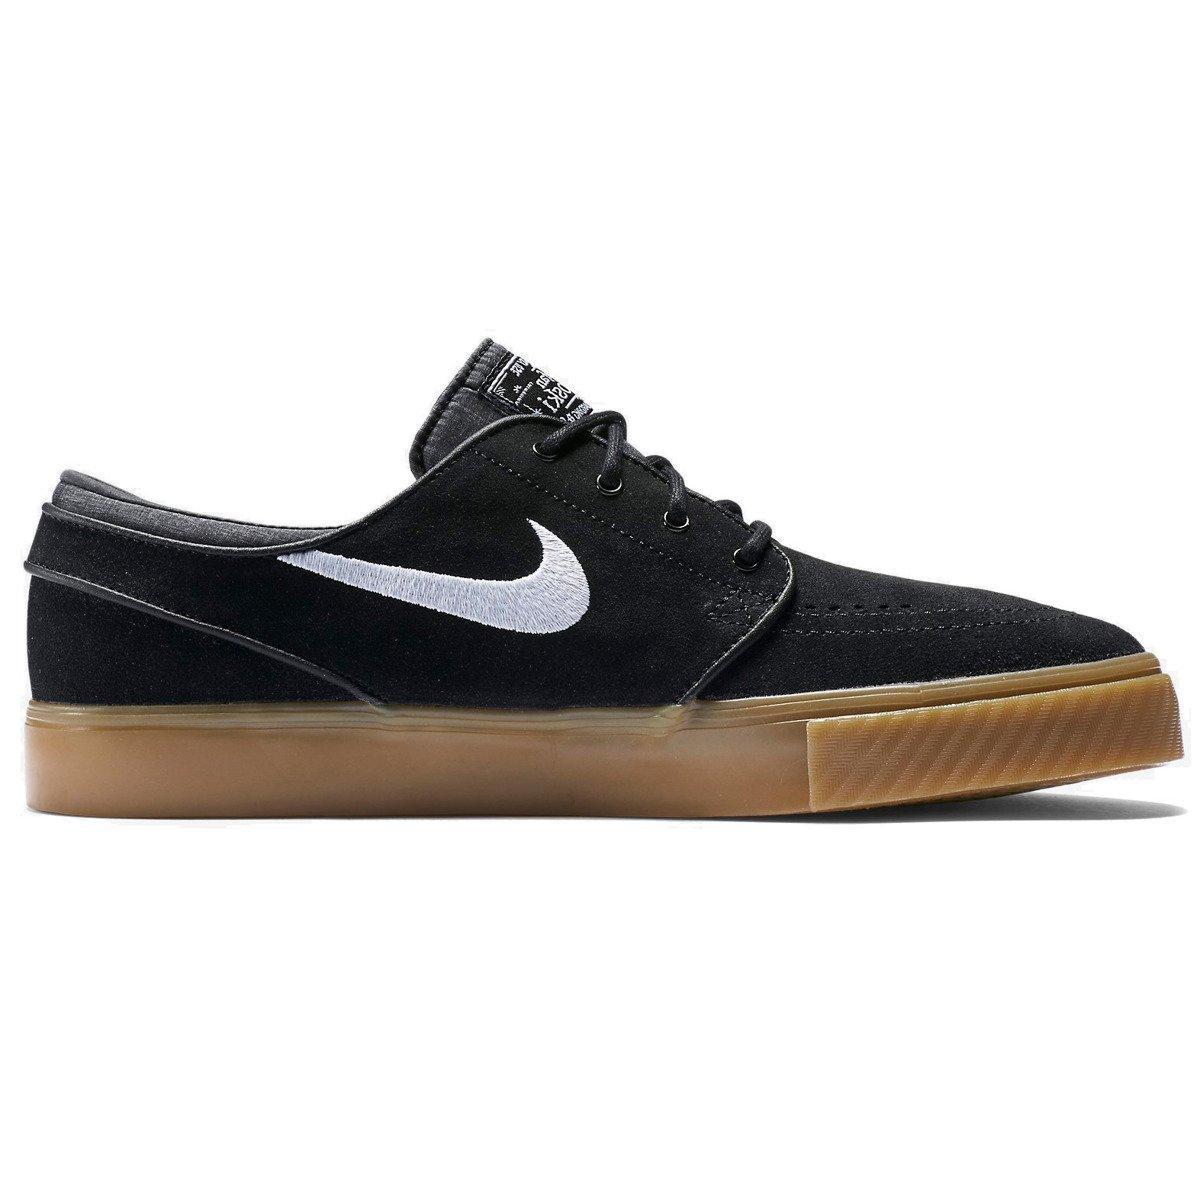 Buty Nike Zoom Stefan Janoski BLACK WHITE-GUM LIGHT BROWN Click to zoom ... ce13b212658f7